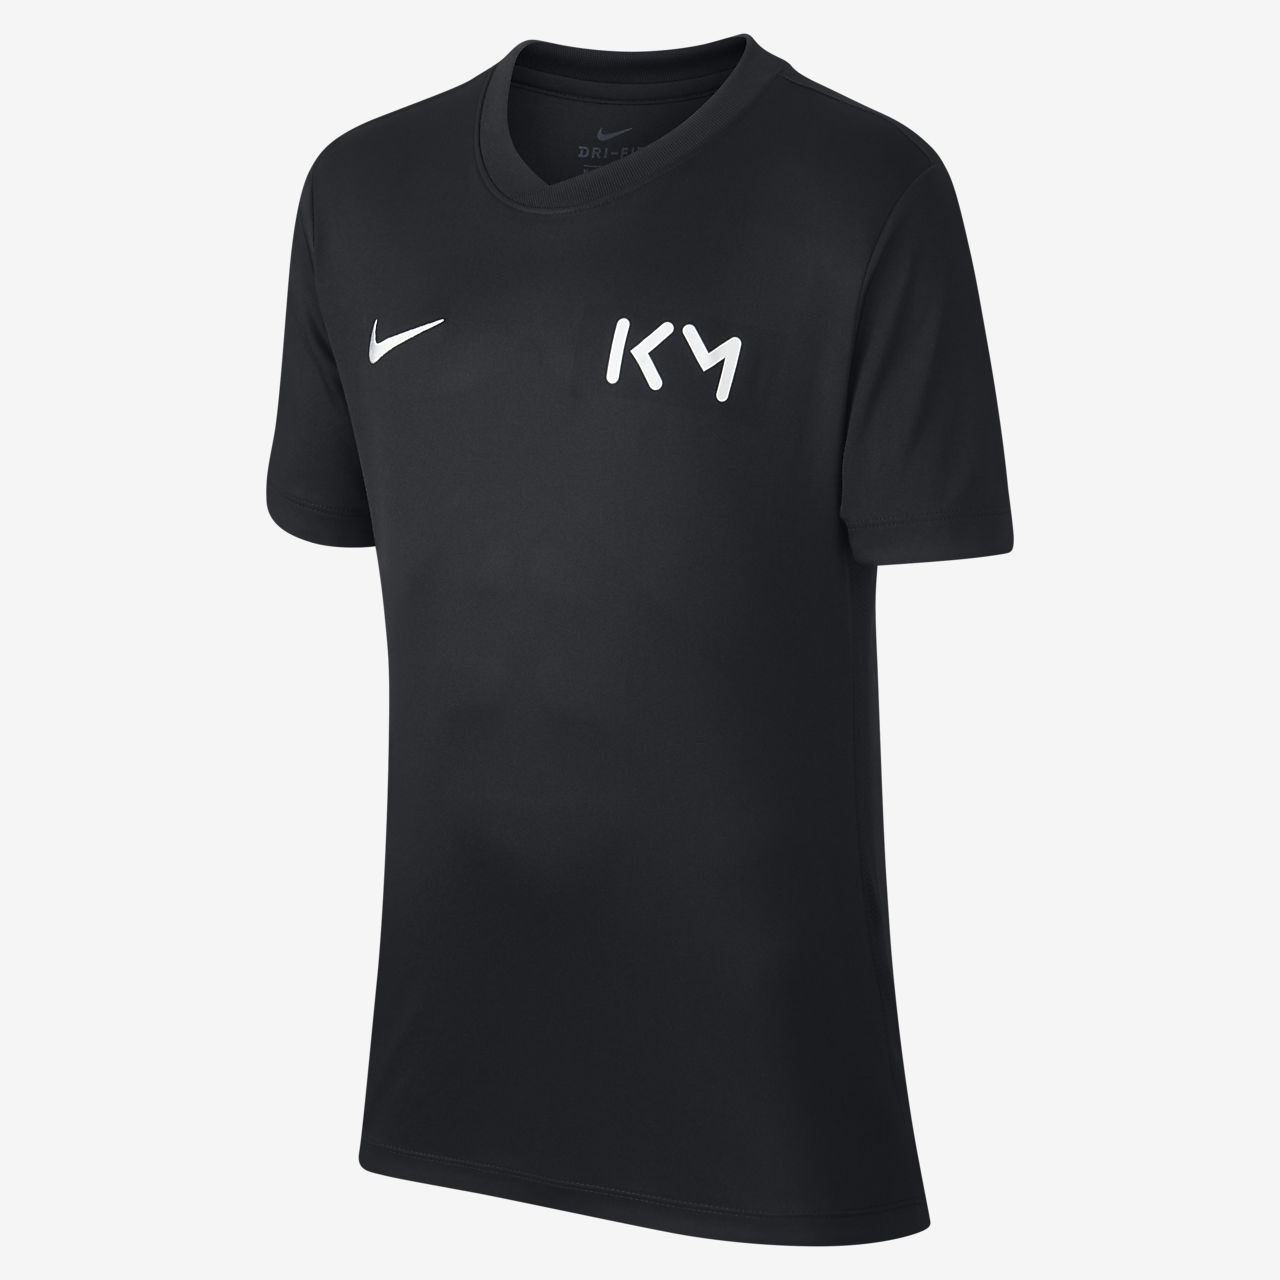 Kylian Mbappé Older Kids' Football Shirt